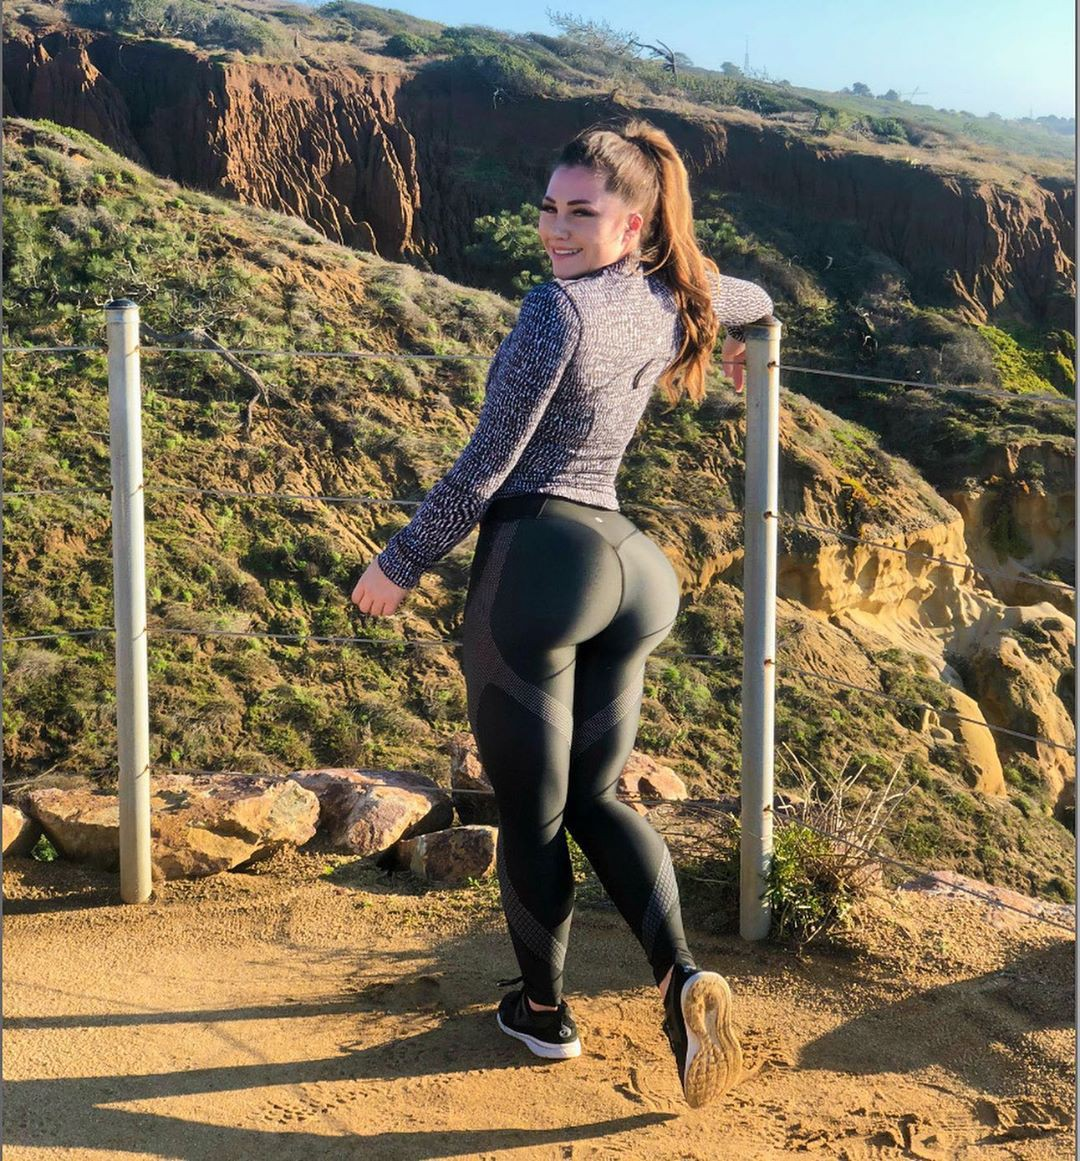 Caitlin Rice sportswear, trousers, leggings clothing ideas